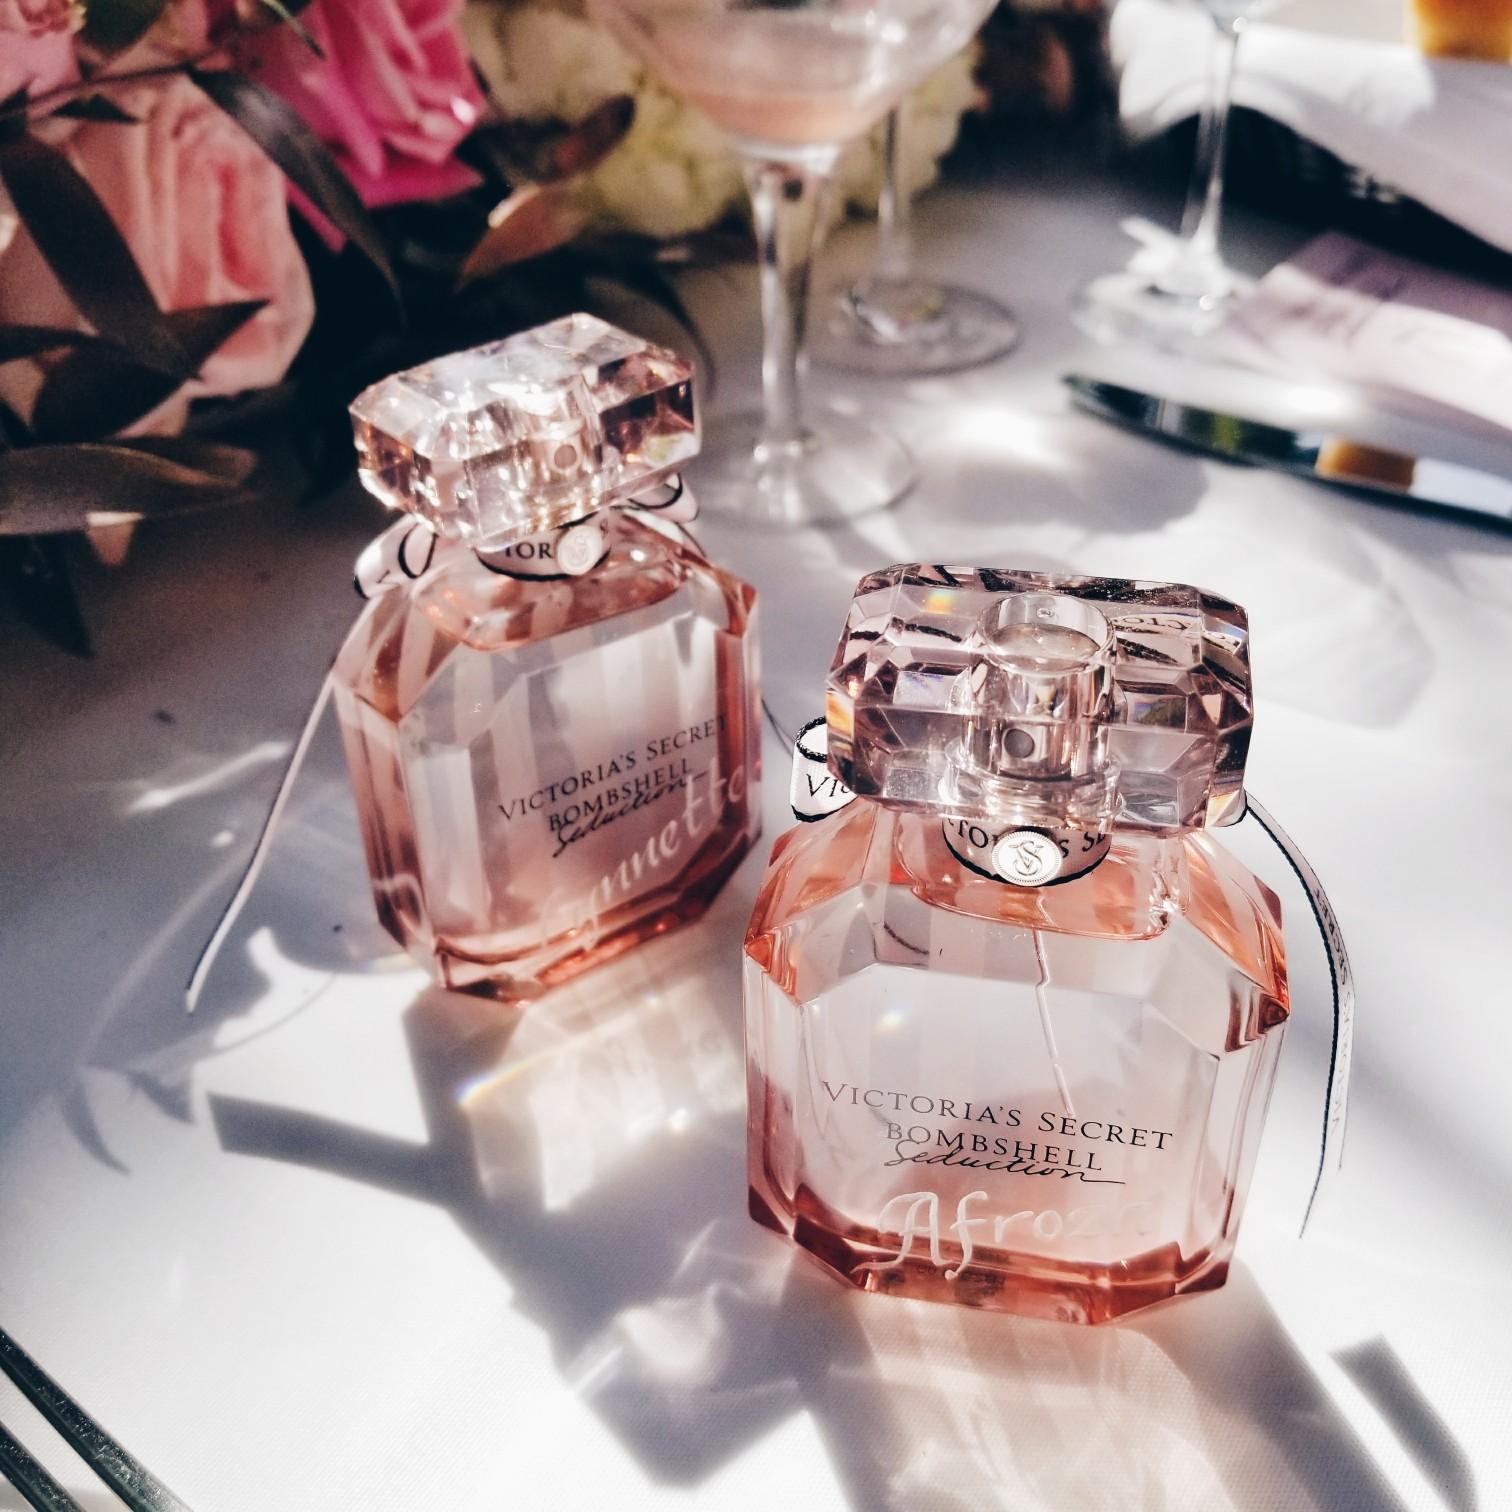 Victoria's Secret Fragrance Bombshell Seduction.